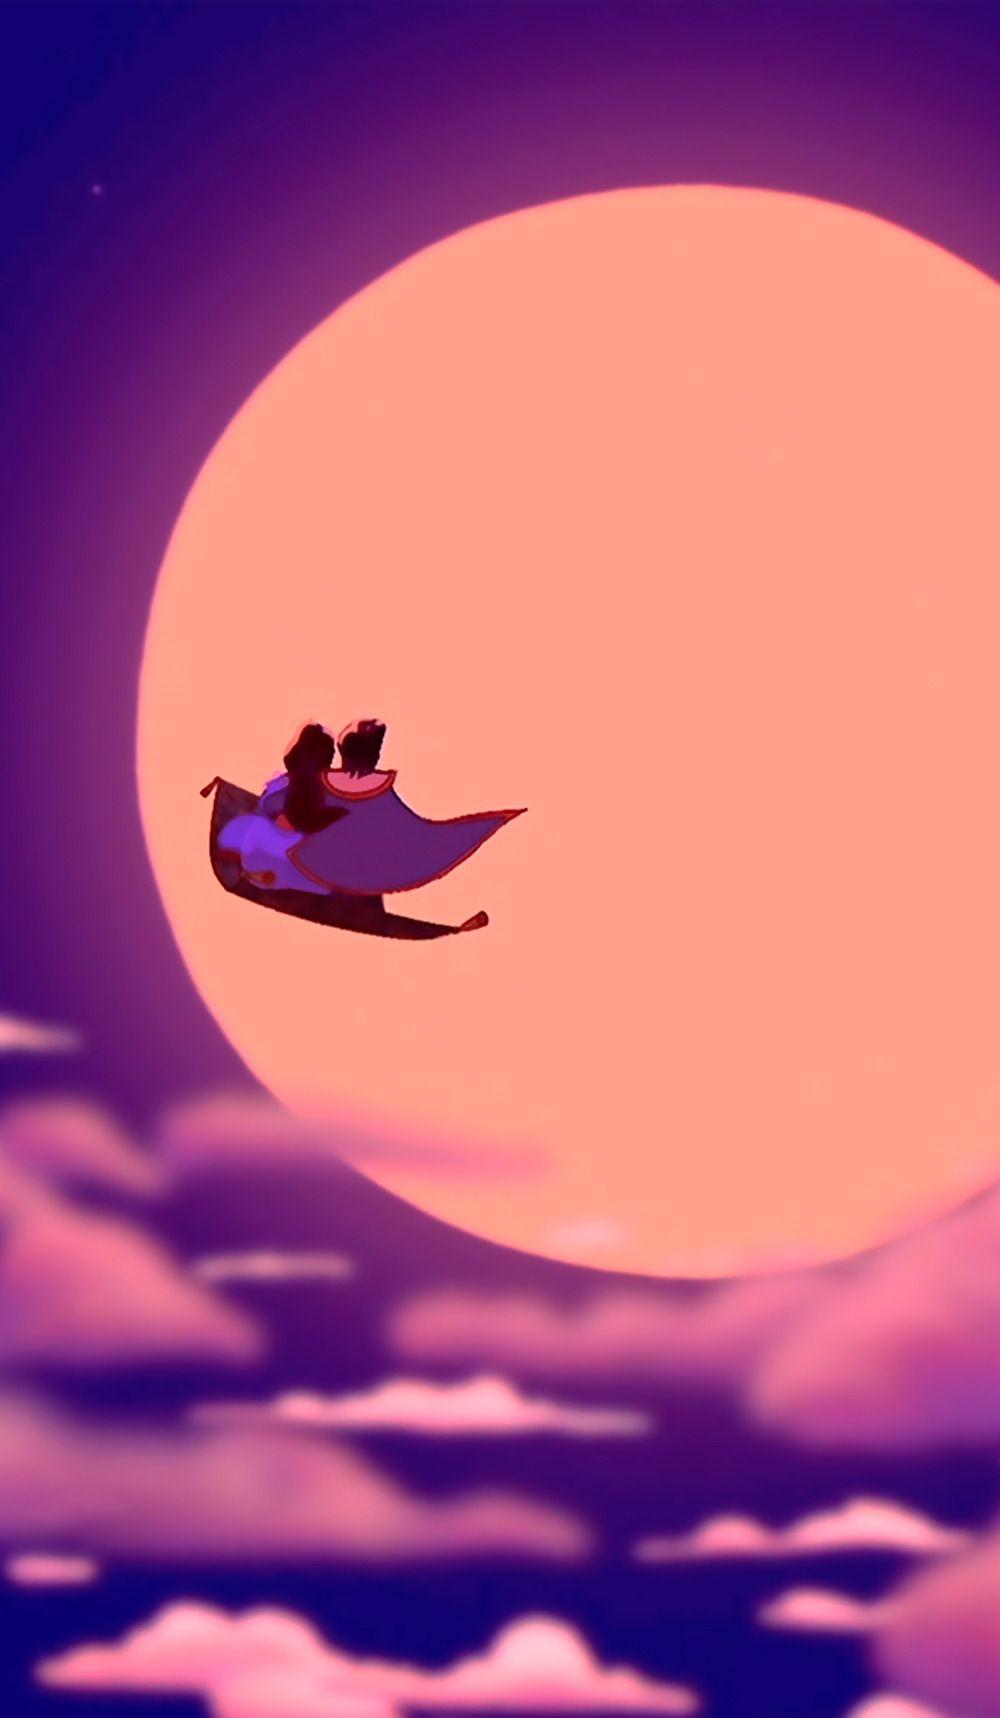 Free Download Aladdin Wallpaper Fondos In 2019 Pinterest